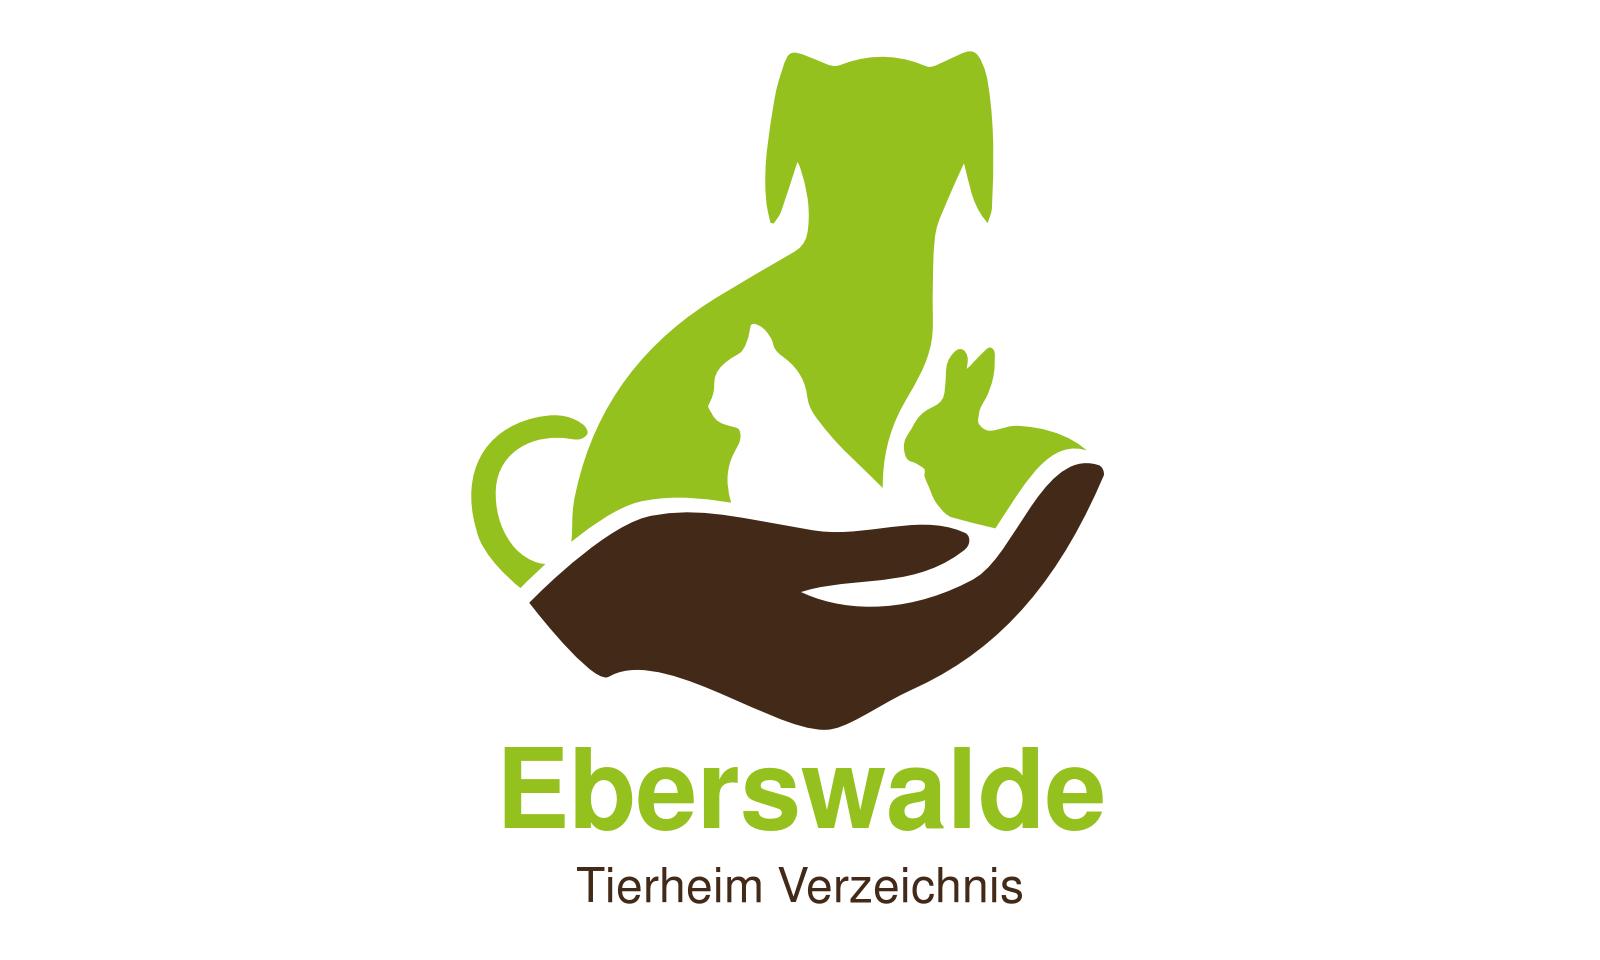 Tierheim Eberswalde